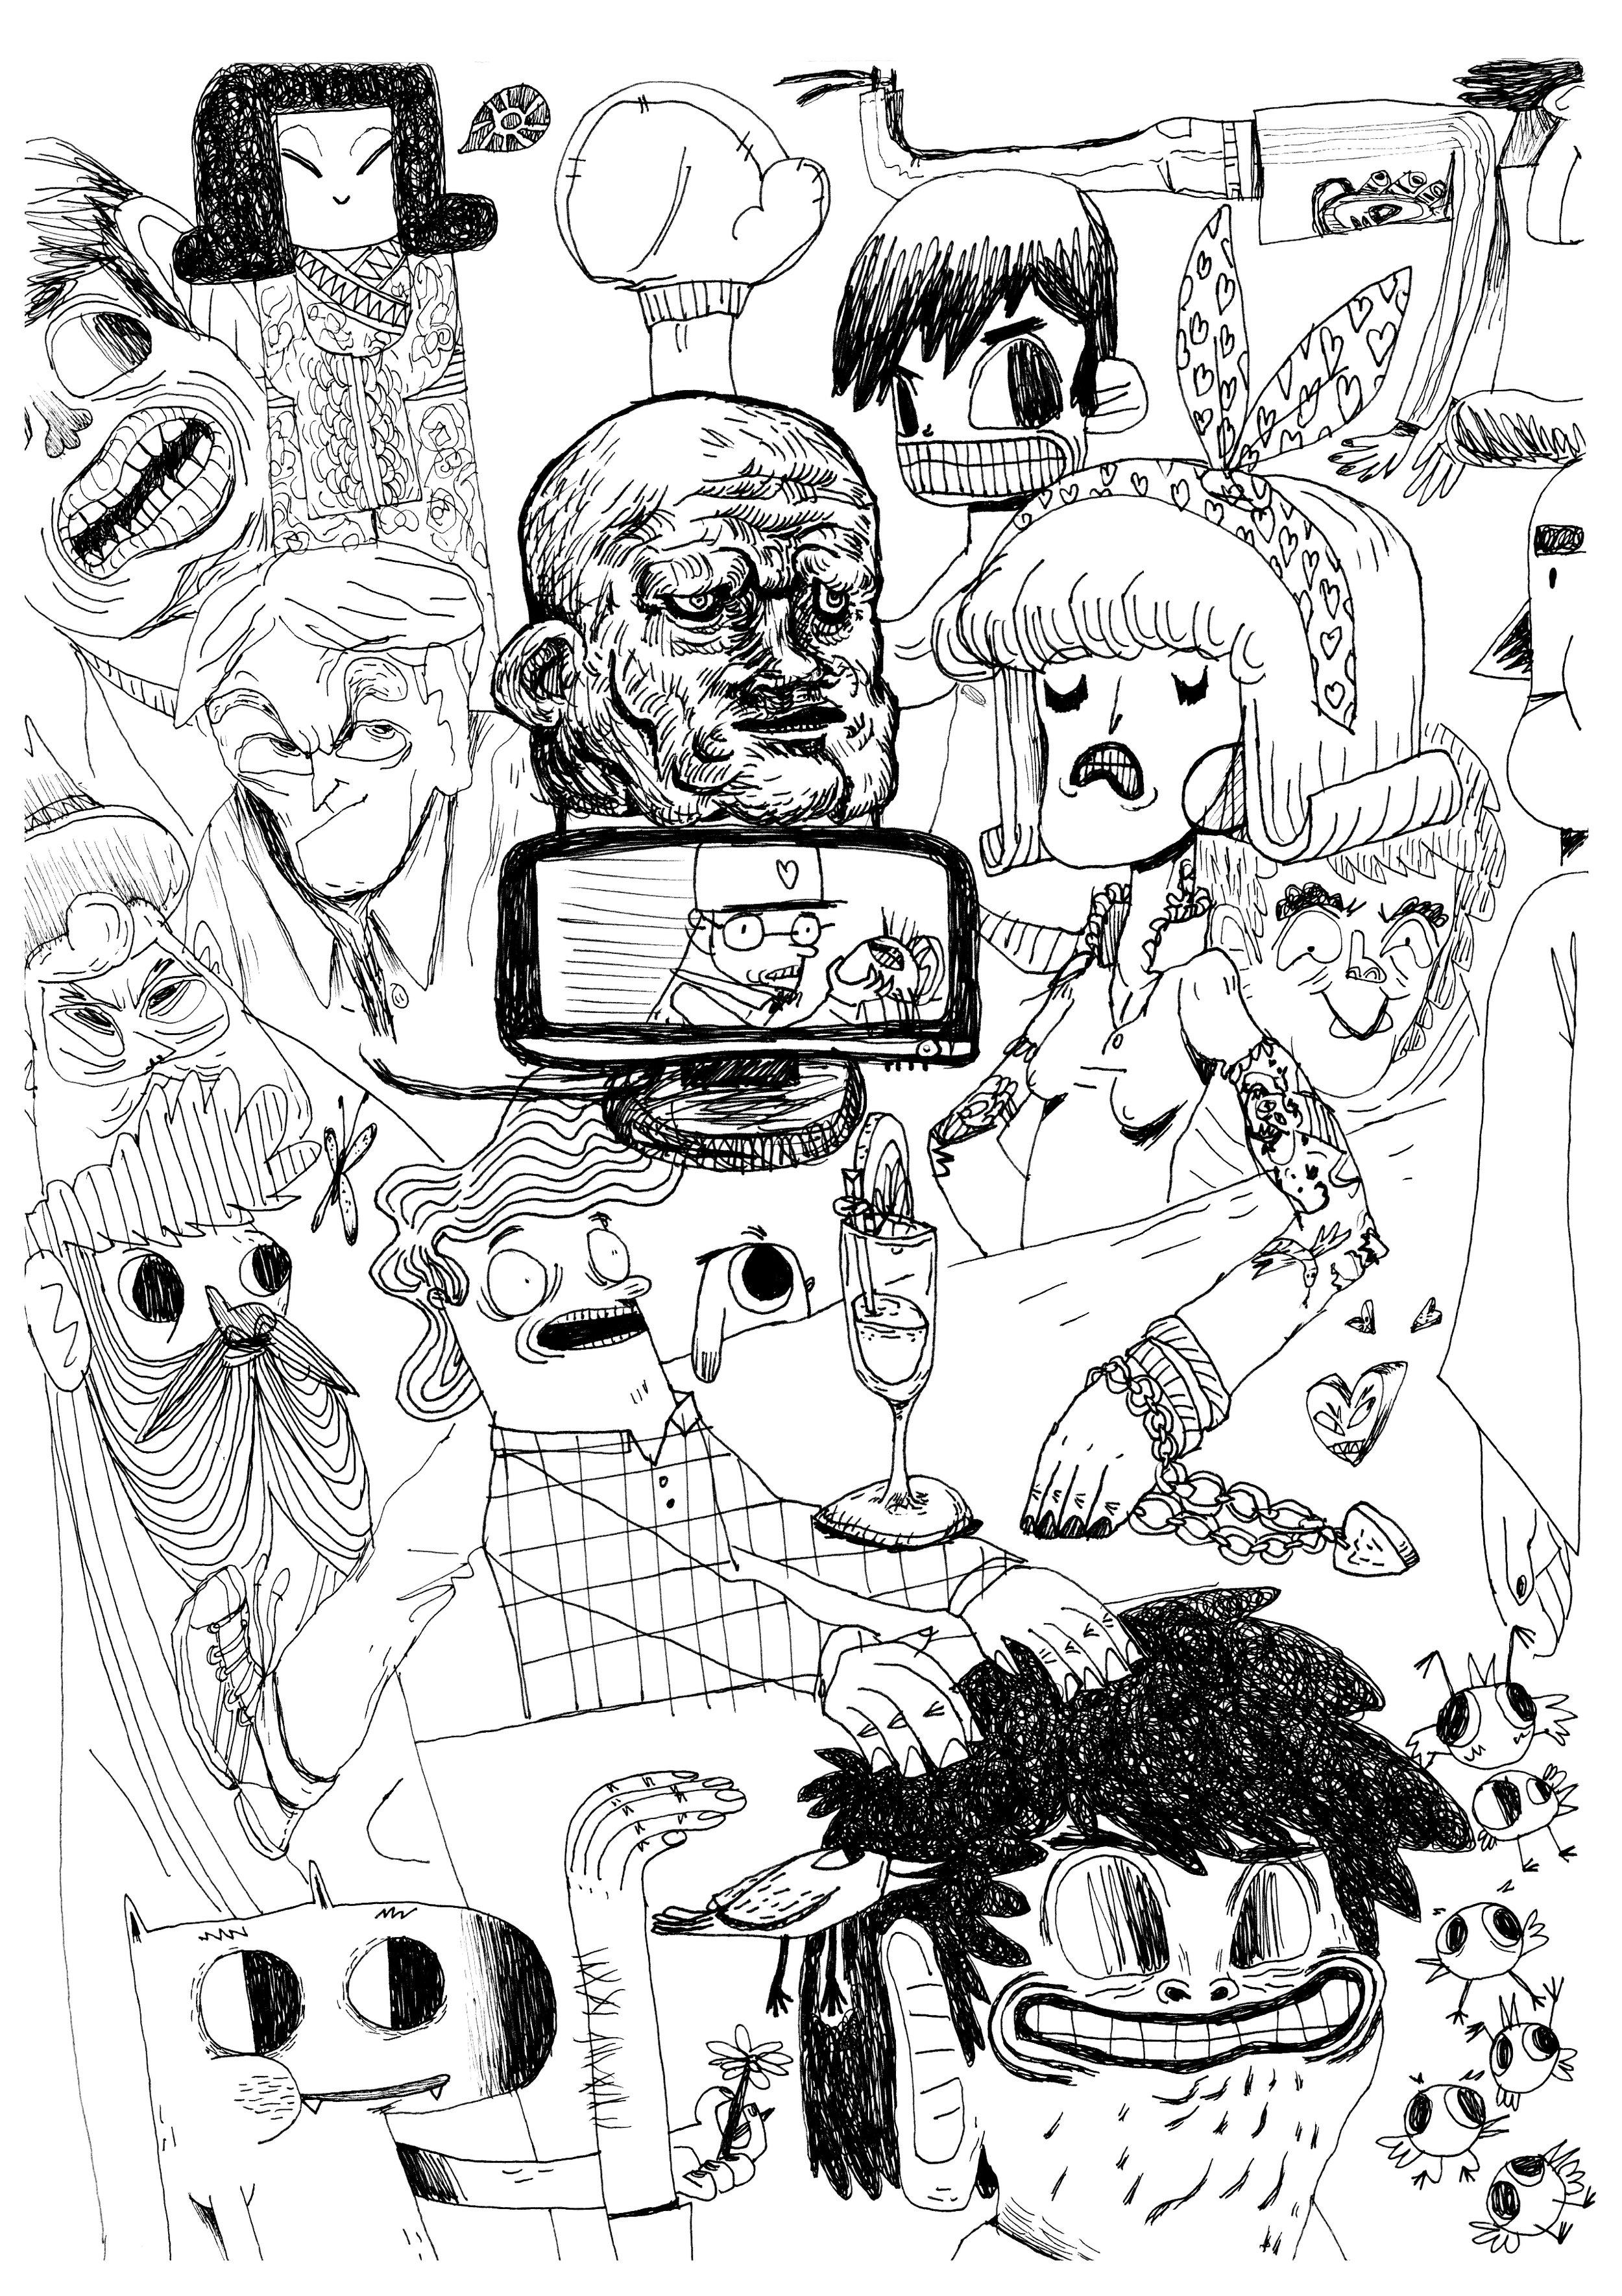 Pascal_Zaffiro_Doodle_33.jpg